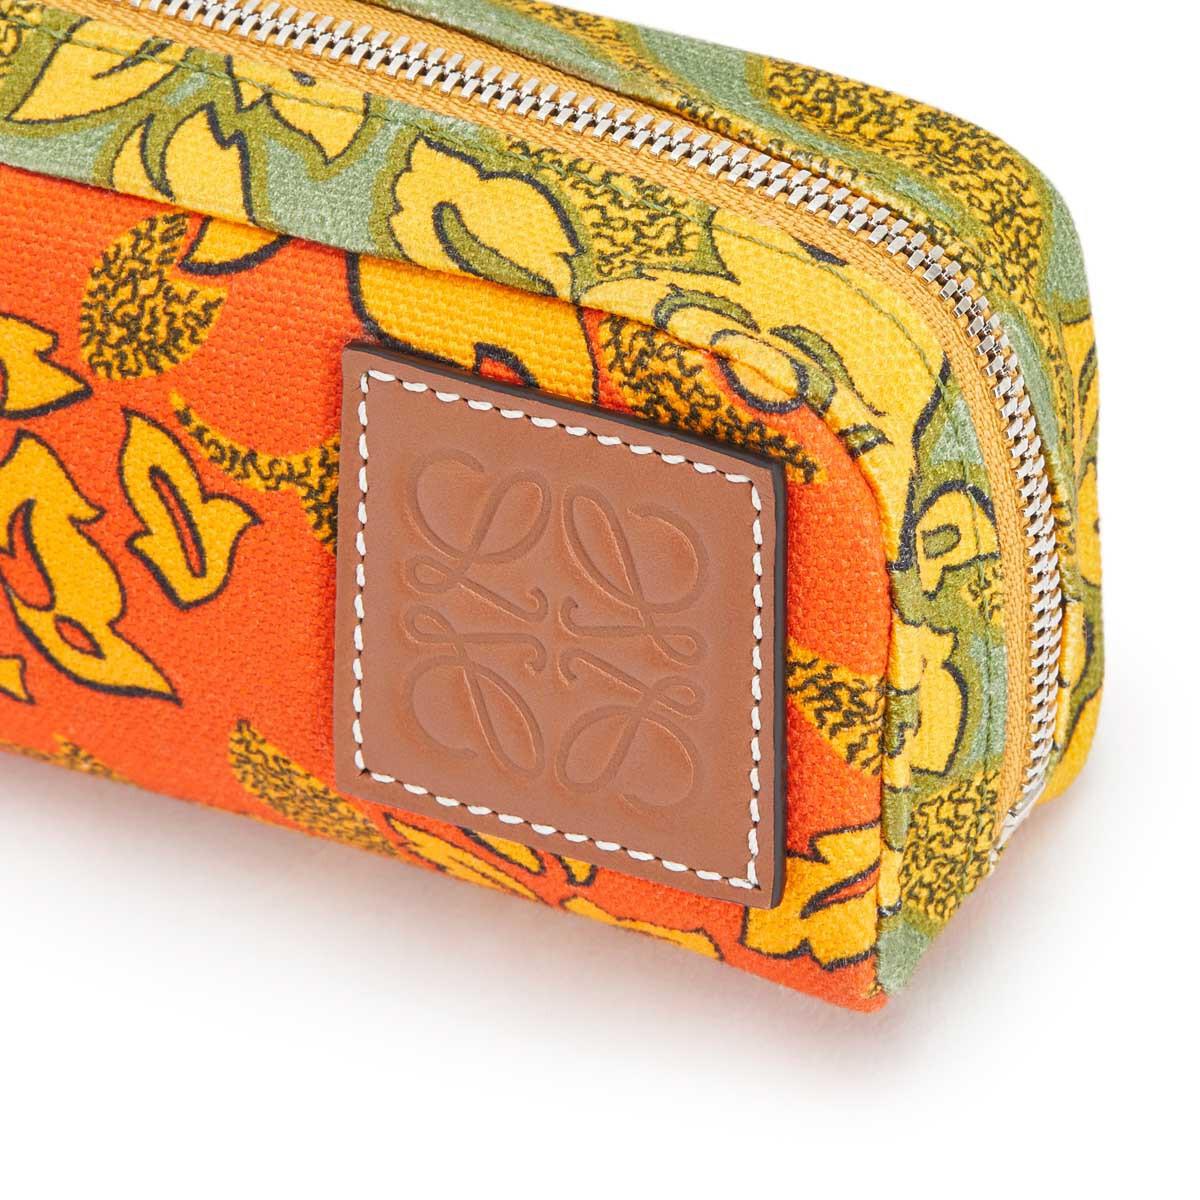 LOEWE Paula Sunglasses Case Orange front